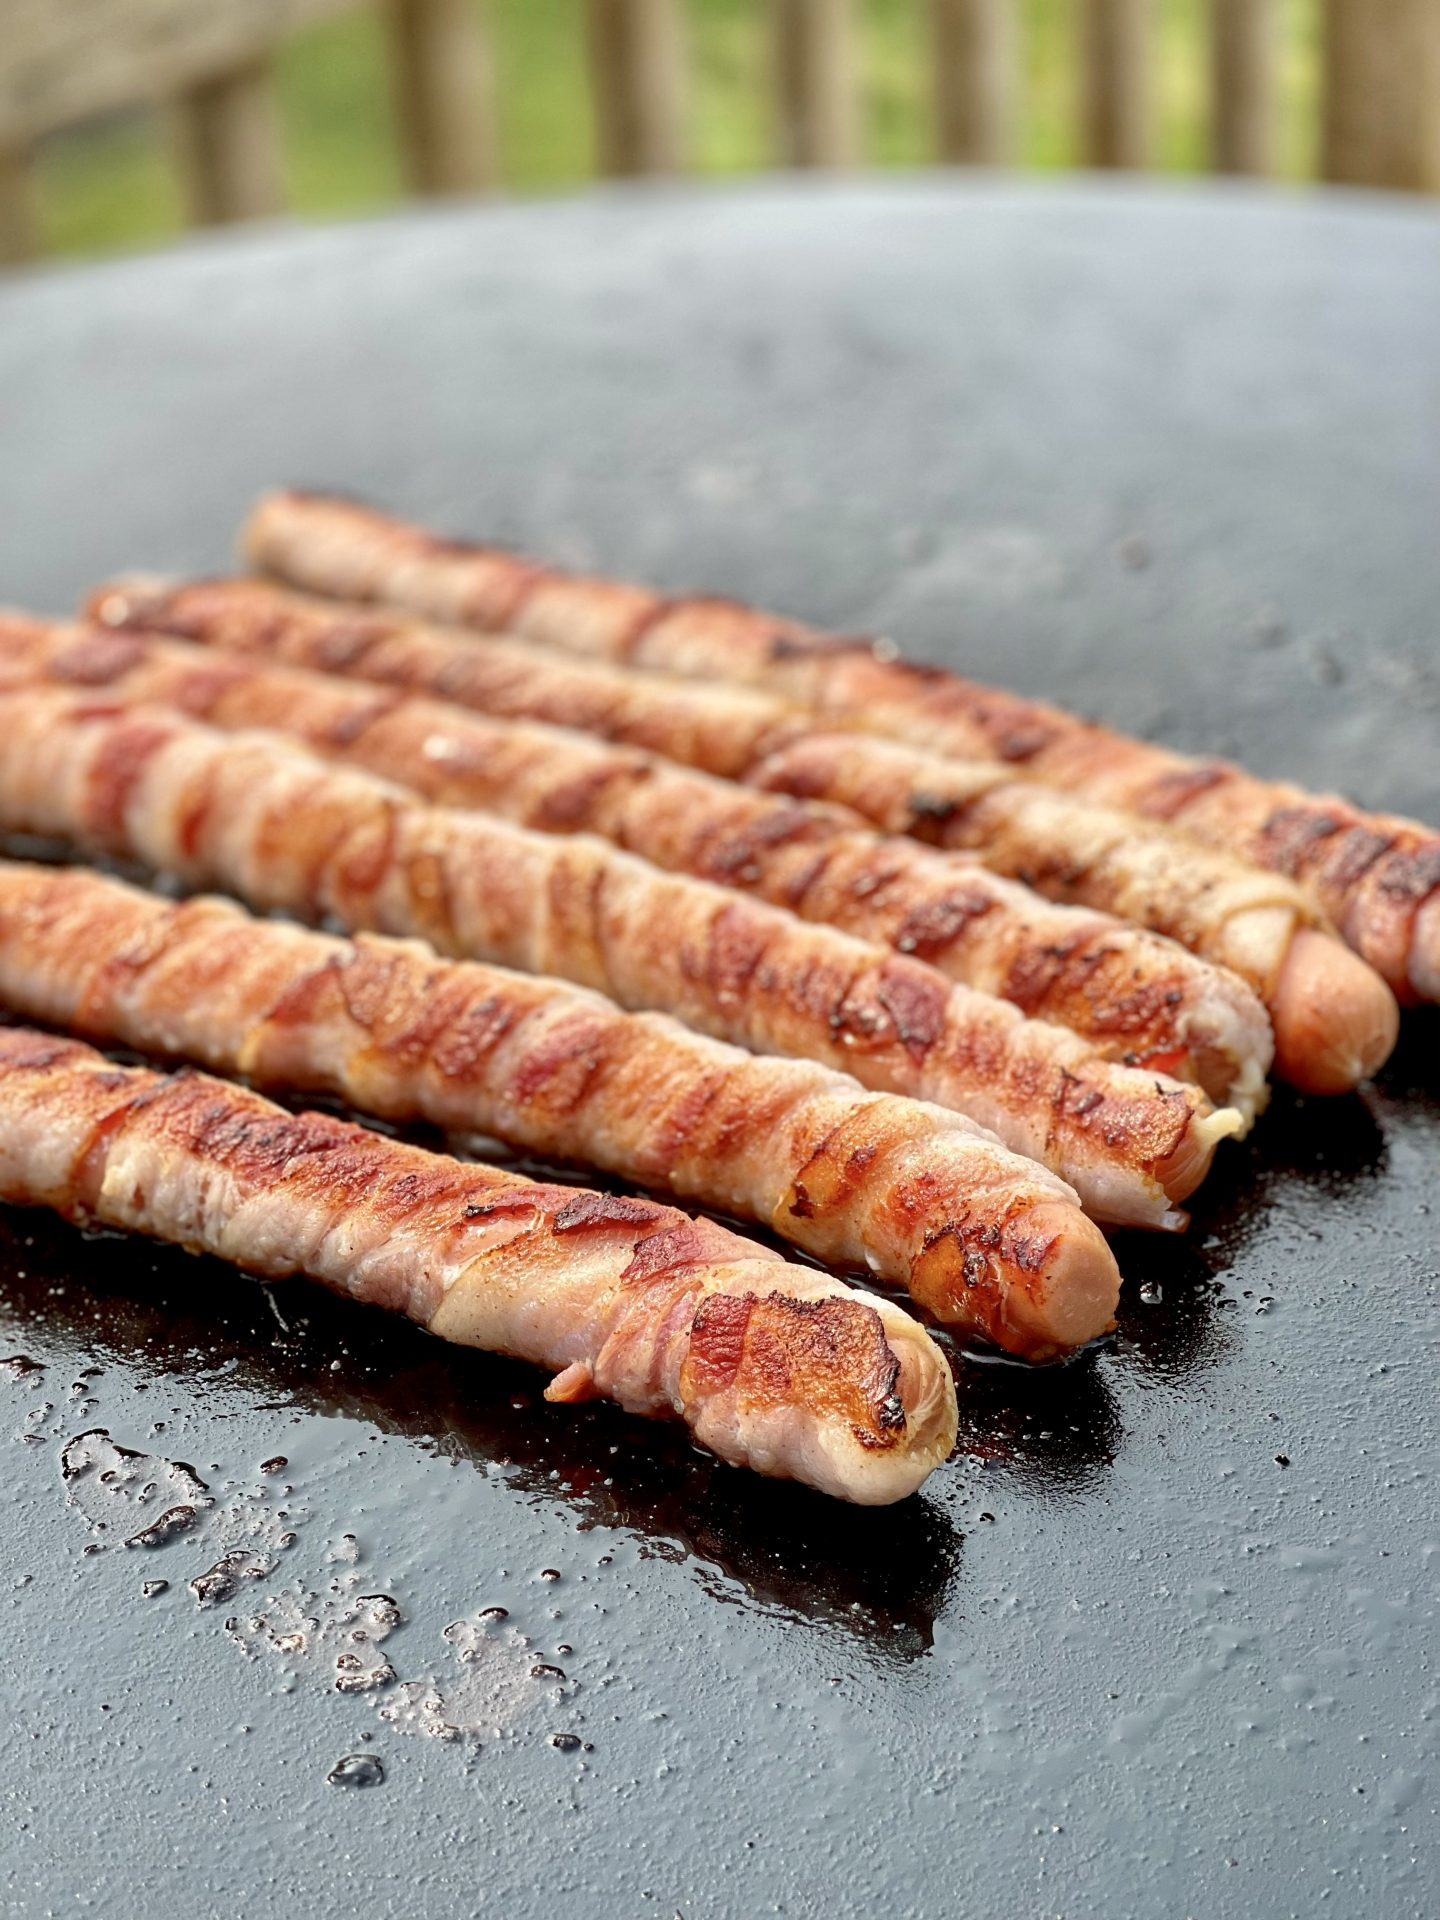 bacon wrapped hotdogs